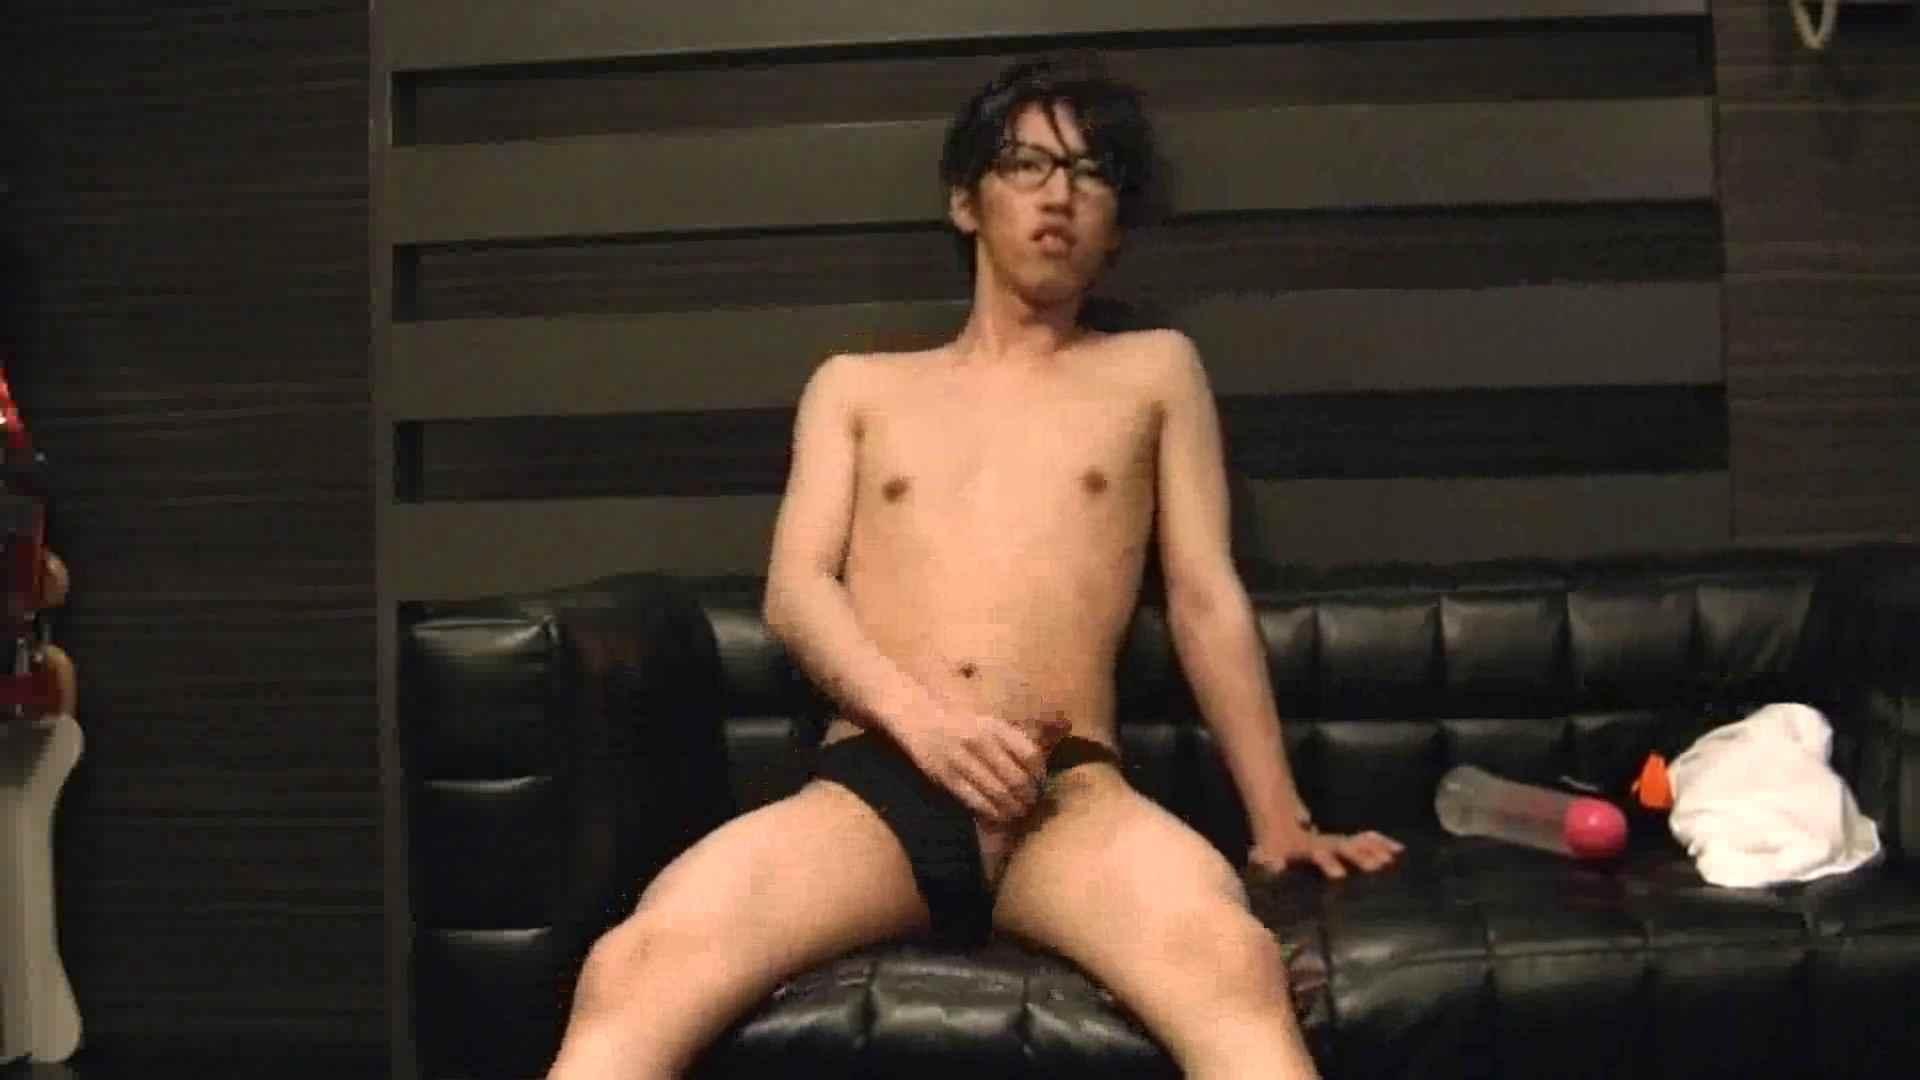 ONA見せカーニバル!! Vol3 男  93pic 72